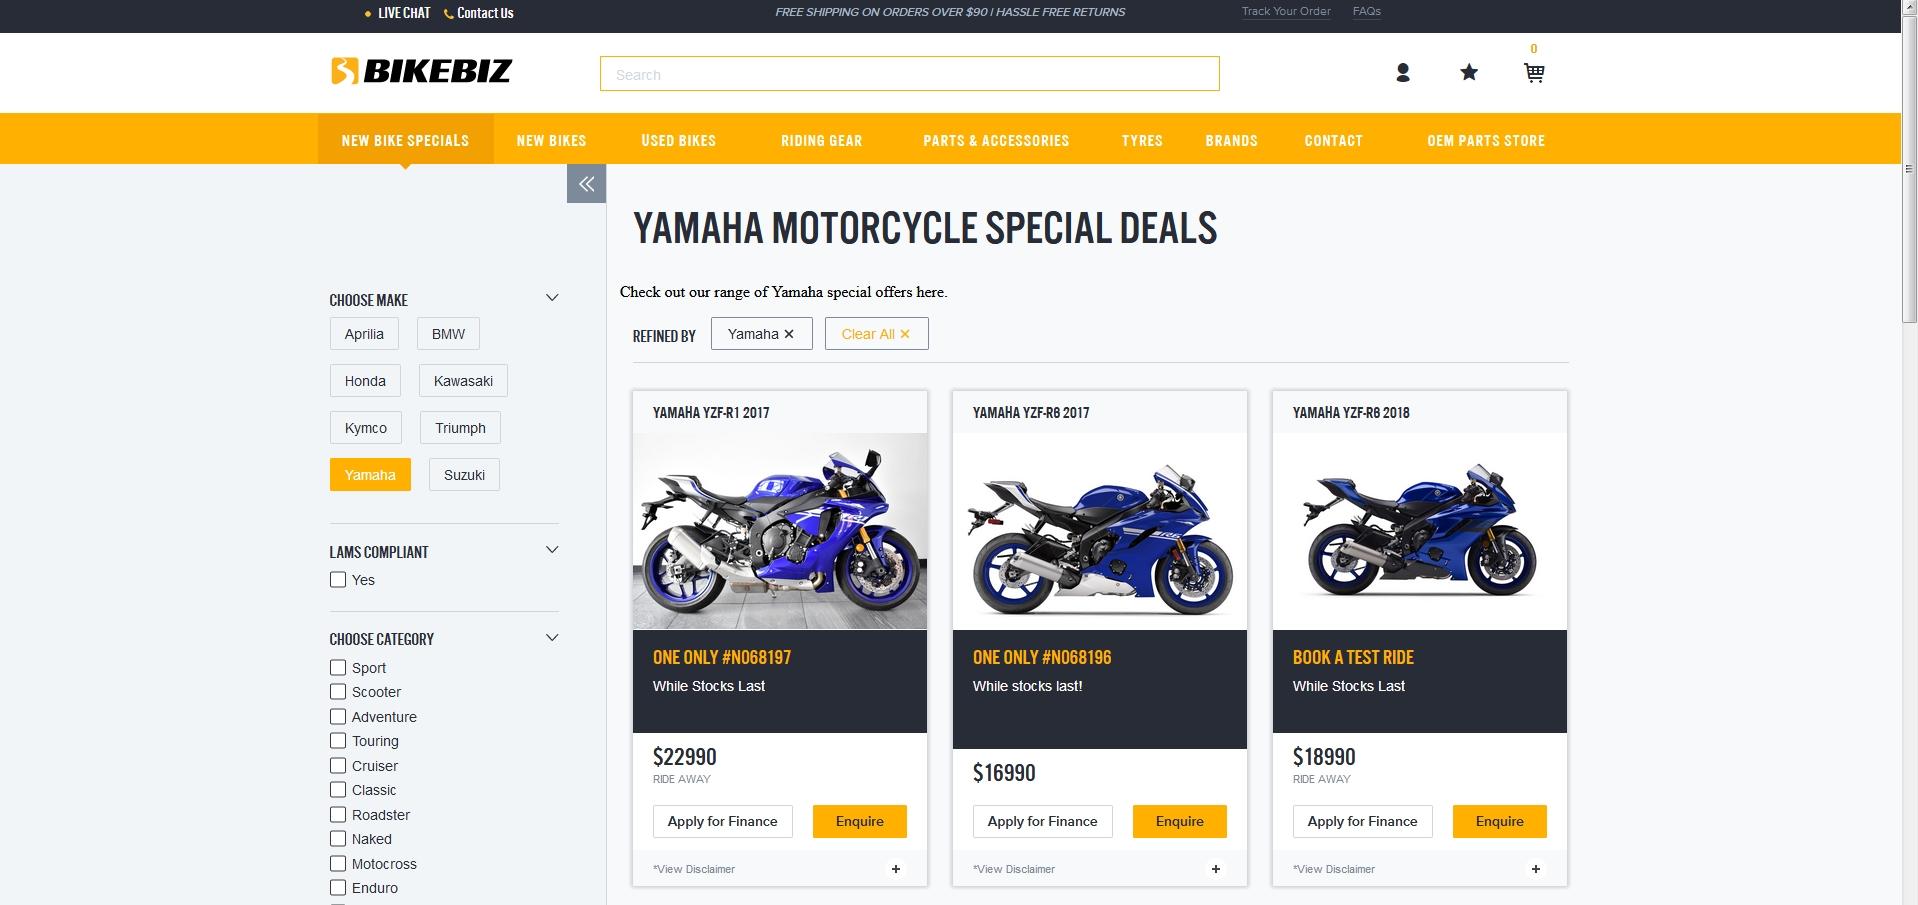 Emberjs implemented for Special Deals Bikebiz section